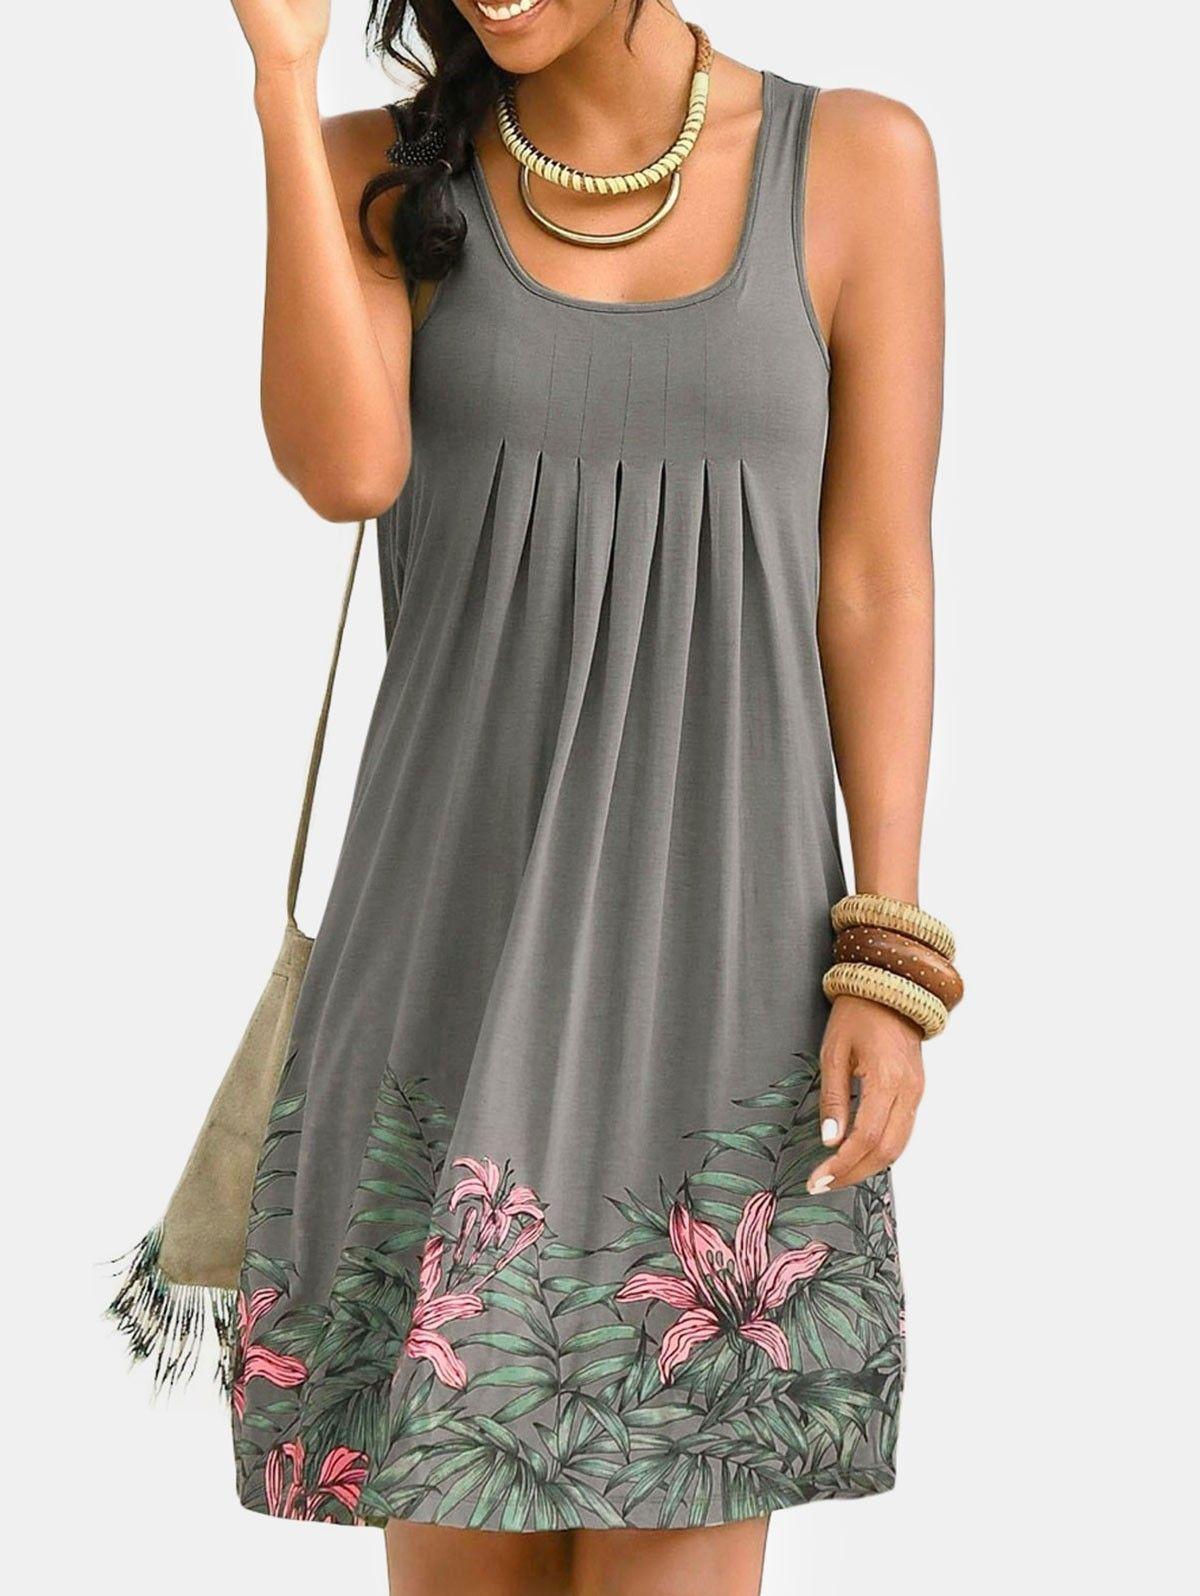 Floral Print Sleeveless Pleated Dress Gray 5z47270612 Size S Sleeveless Dresses Casual Casual Dresses Womens Dresses [ 1596 x 1200 Pixel ]